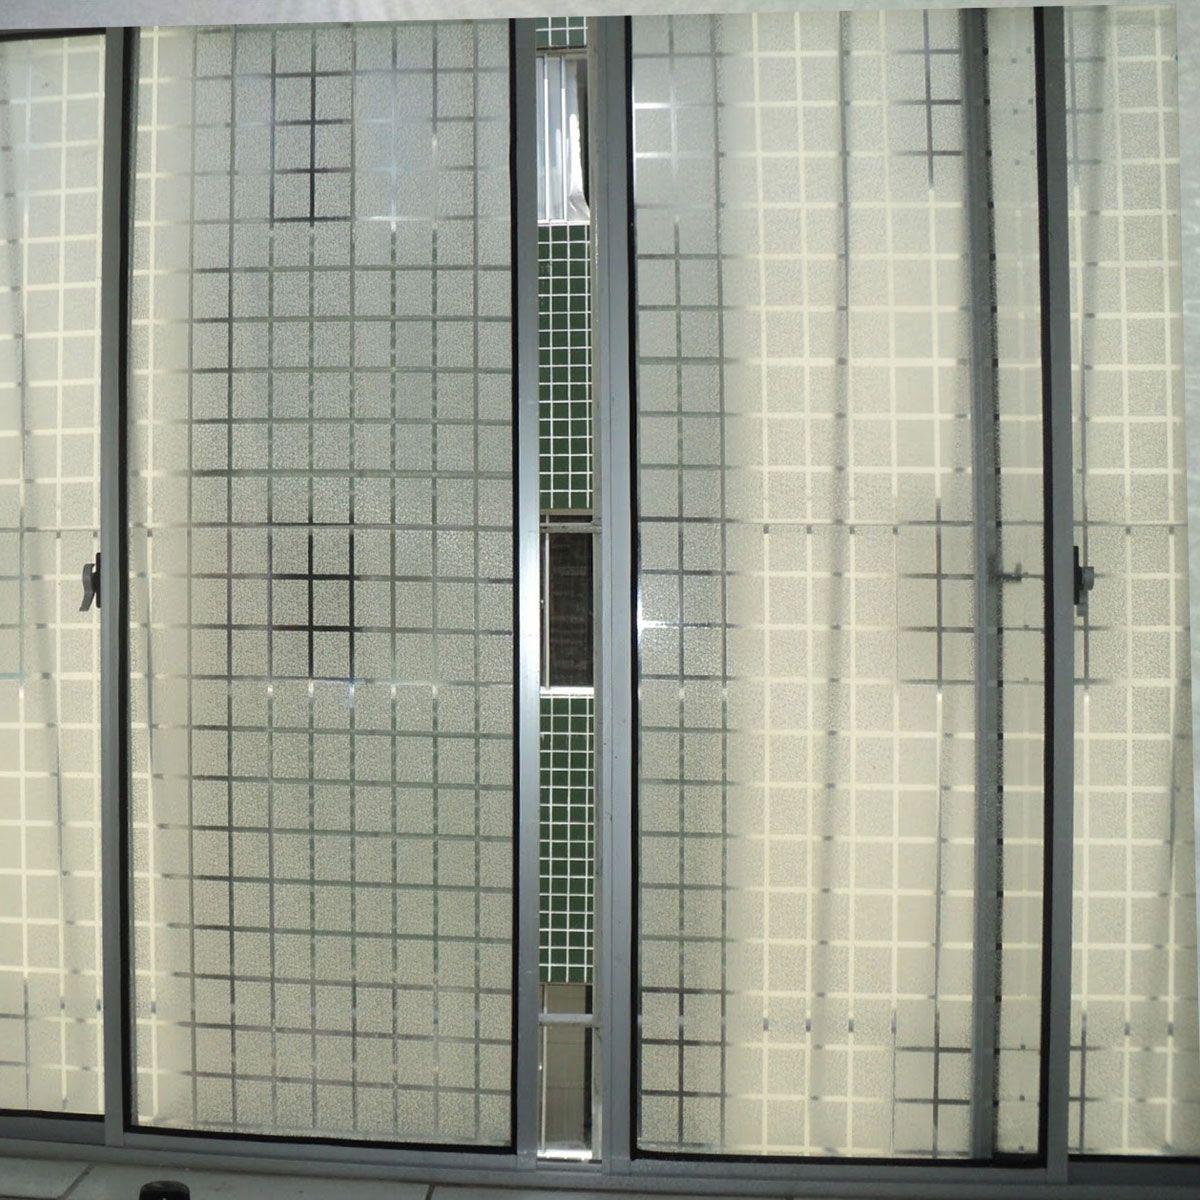 Adesivo Decorativo Jateado Quadriculado P/ Vidro, Box, Janela e Portas 1 x 1m